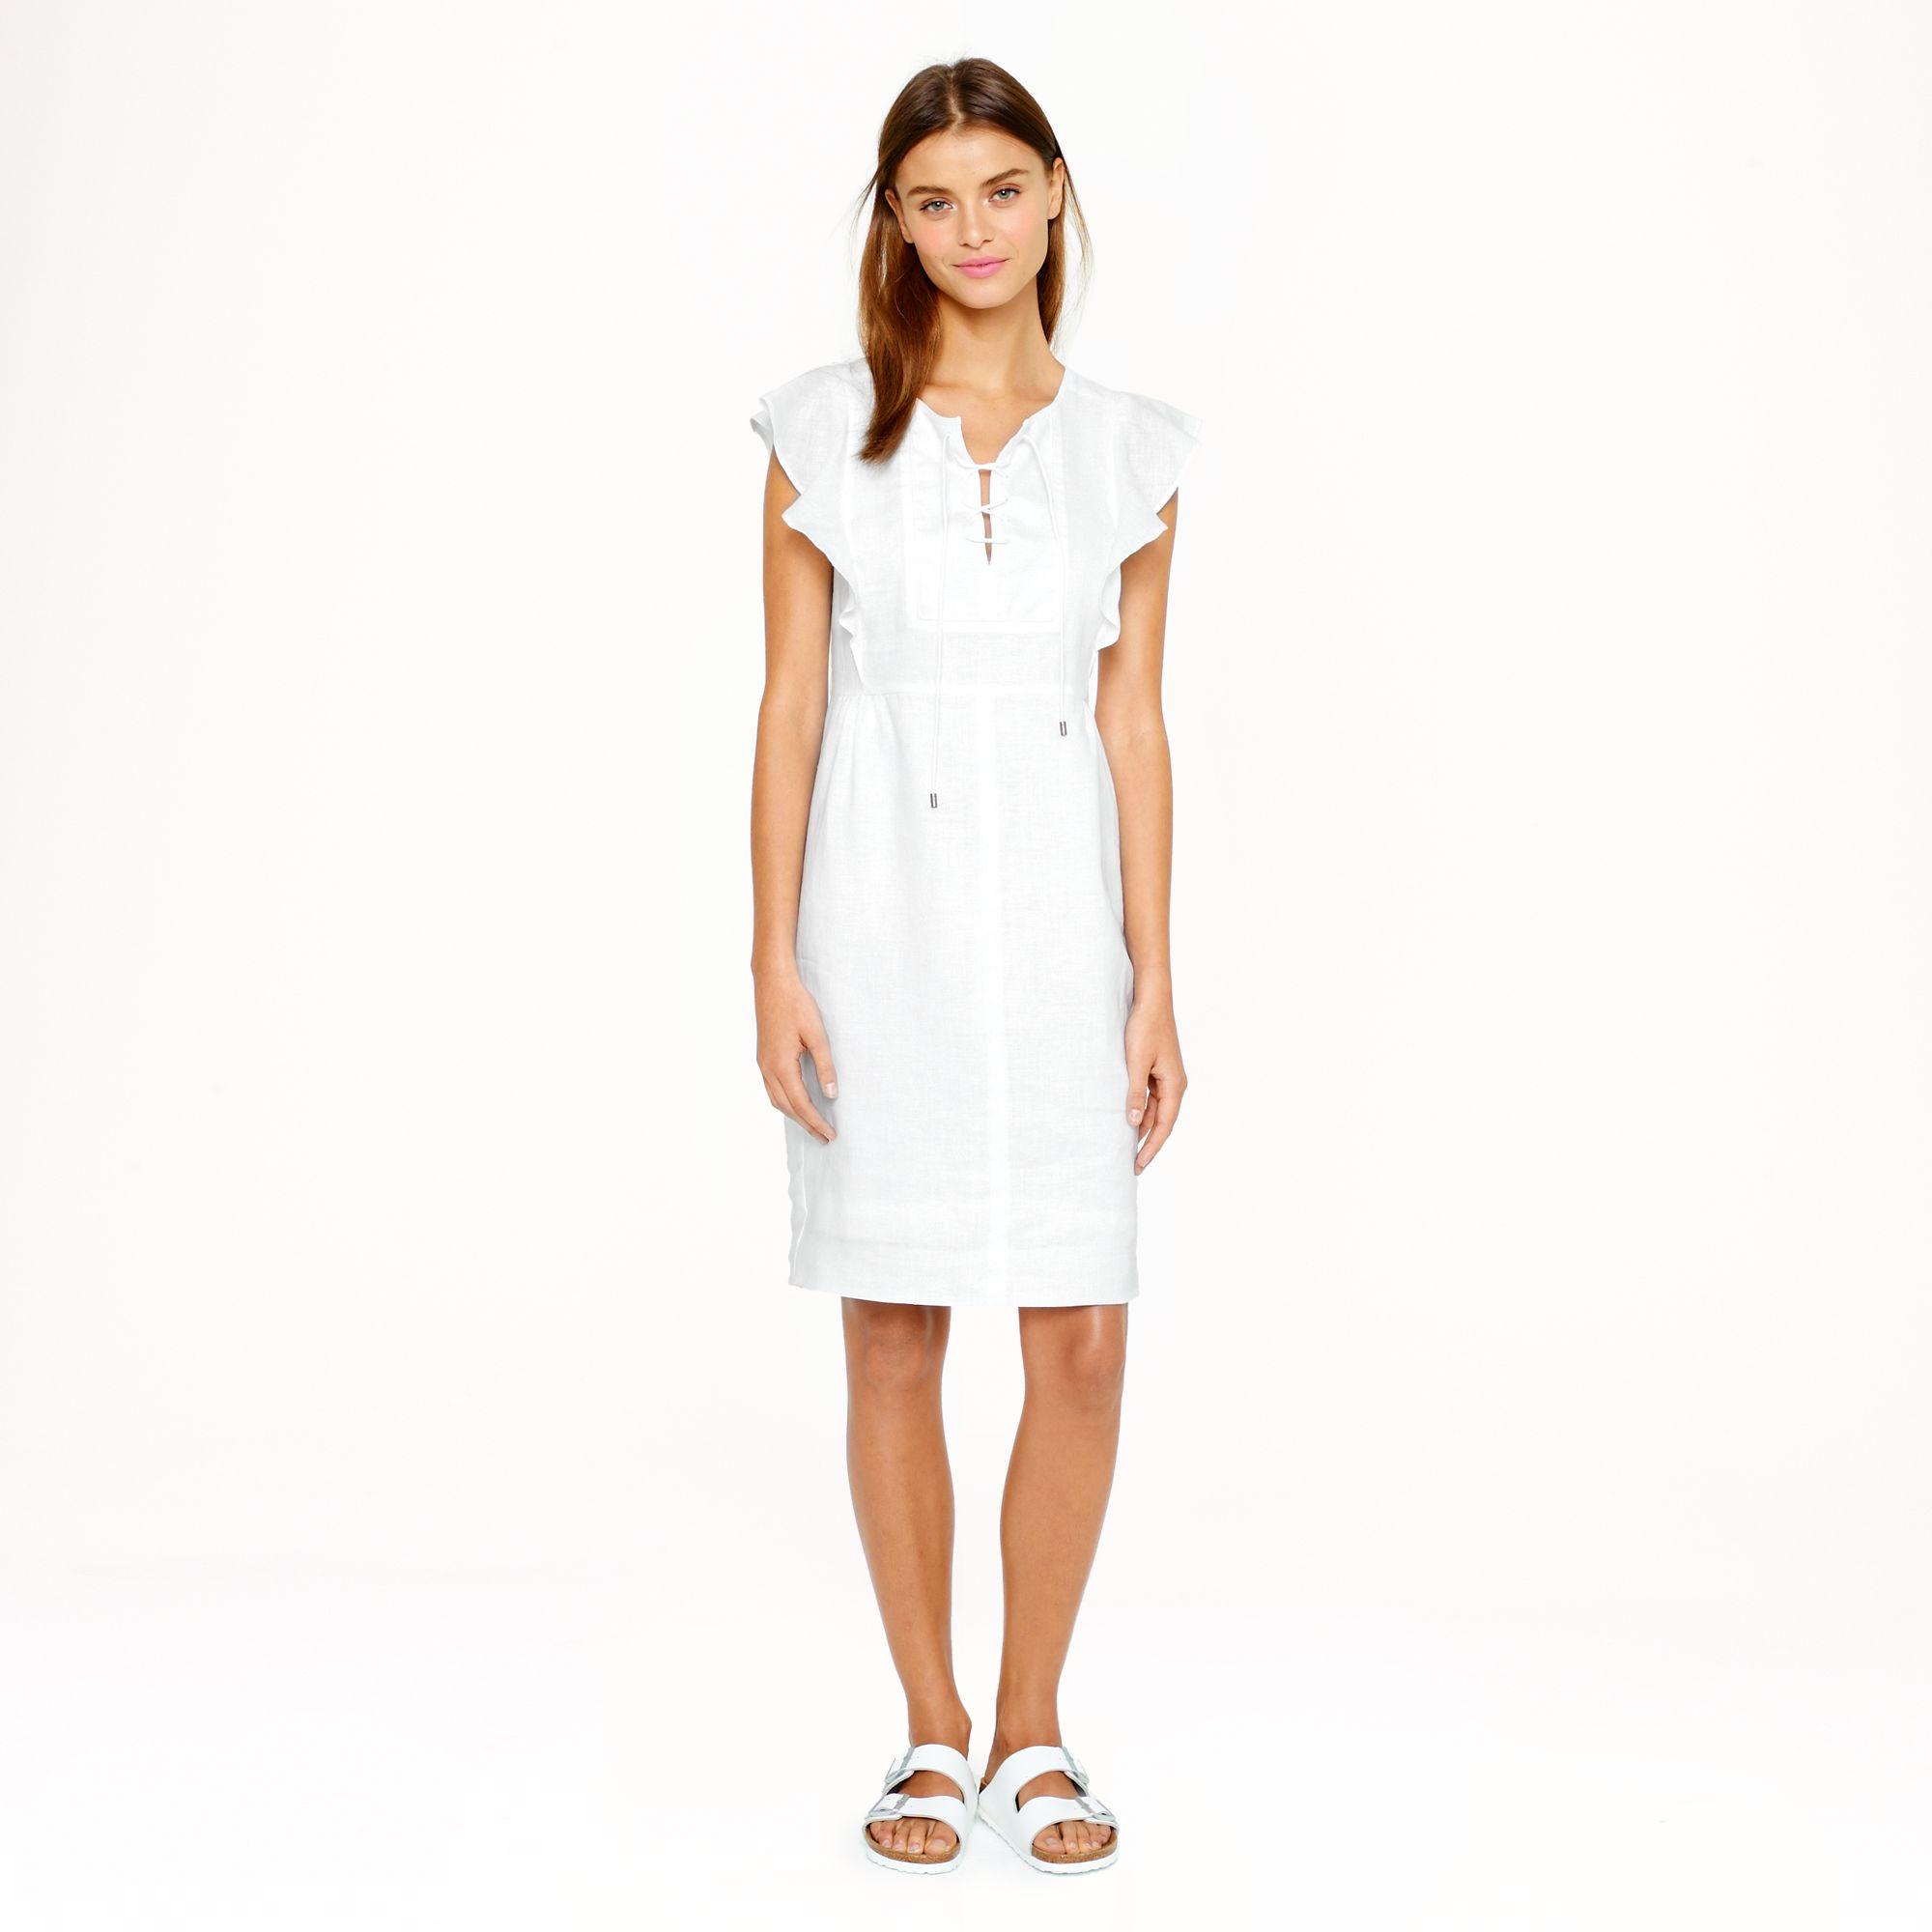 ac30edaebb4 Lyst - J.Crew Laceup Dress in Linen in White